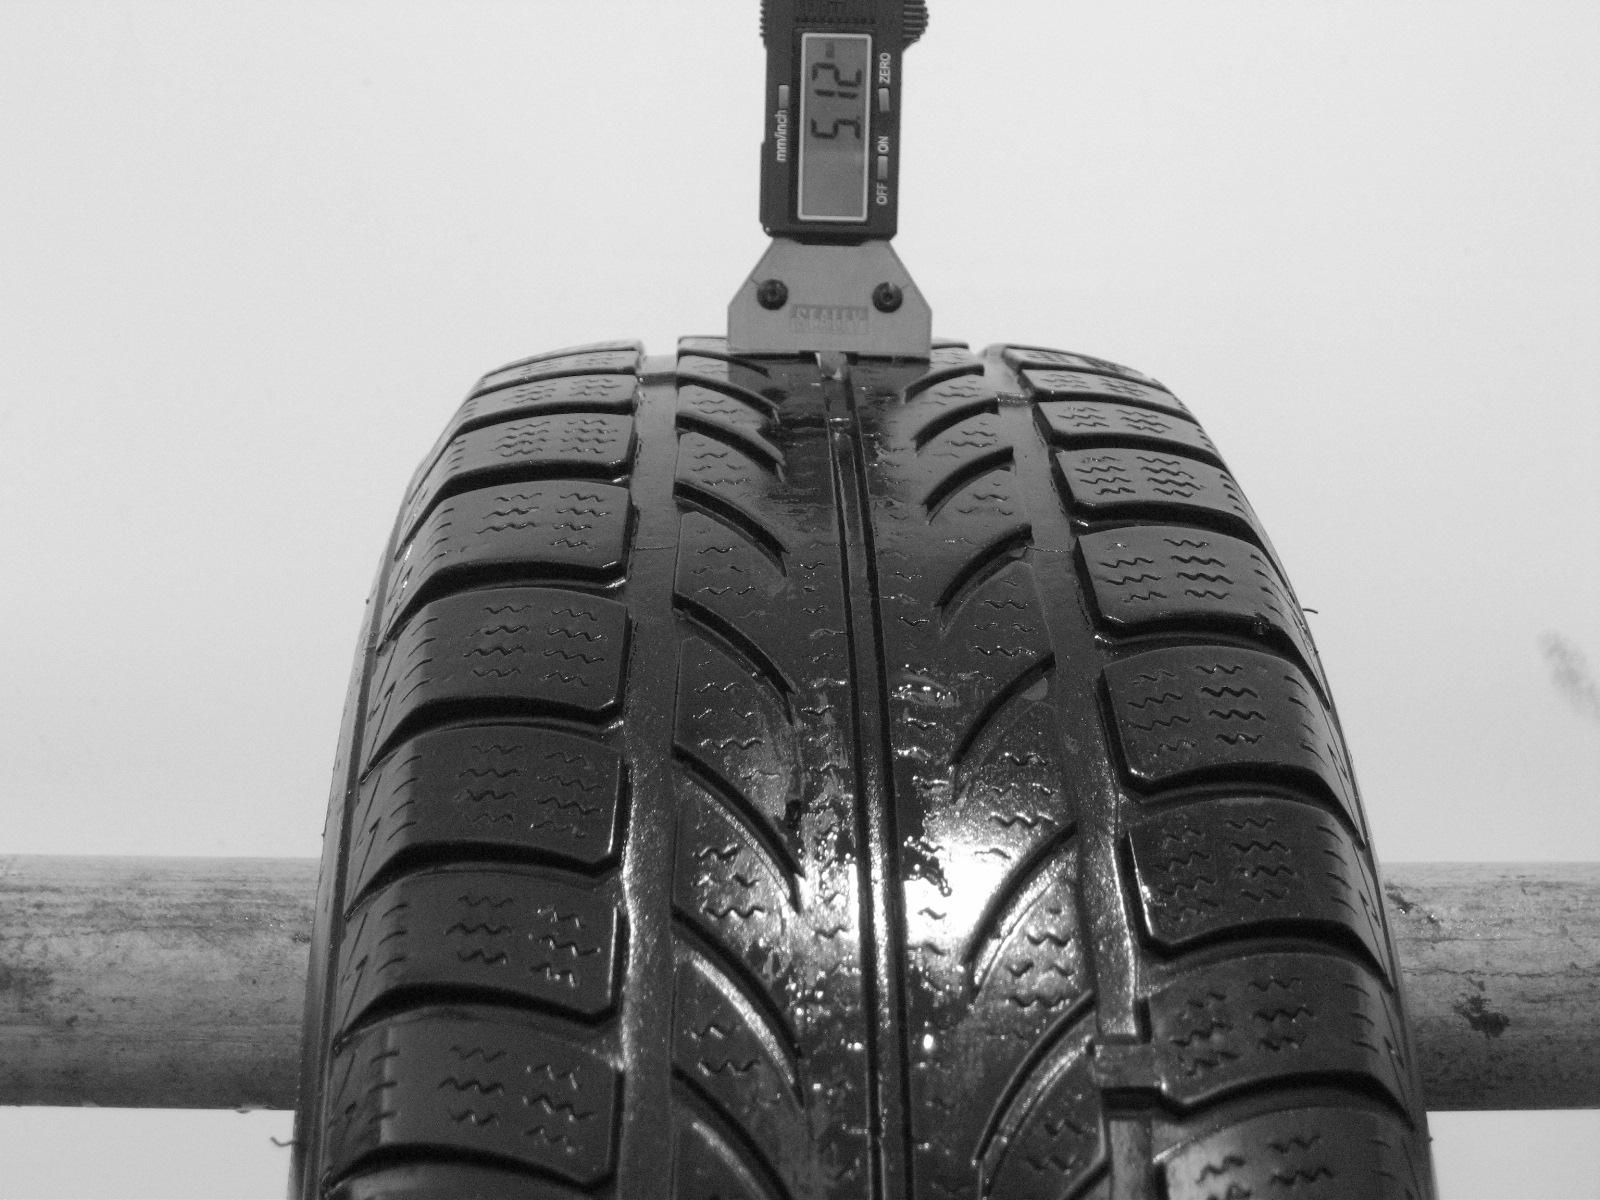 Použité-Pneu-Bazar - 195/65 R15 HANKOOK ICEBEAR W440 -kusovka-rezerva 3mm